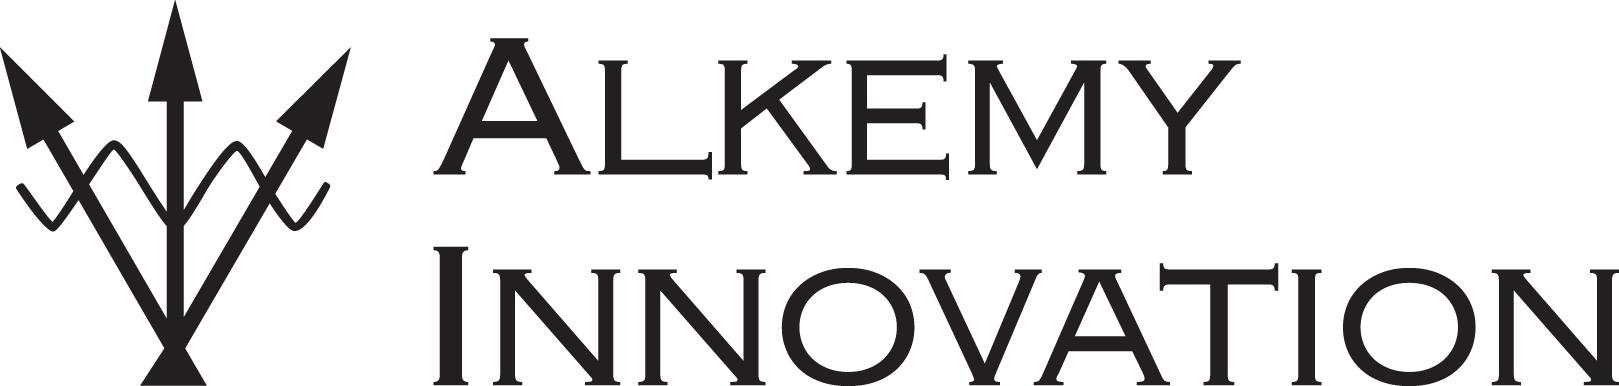 Alkemy Innovation